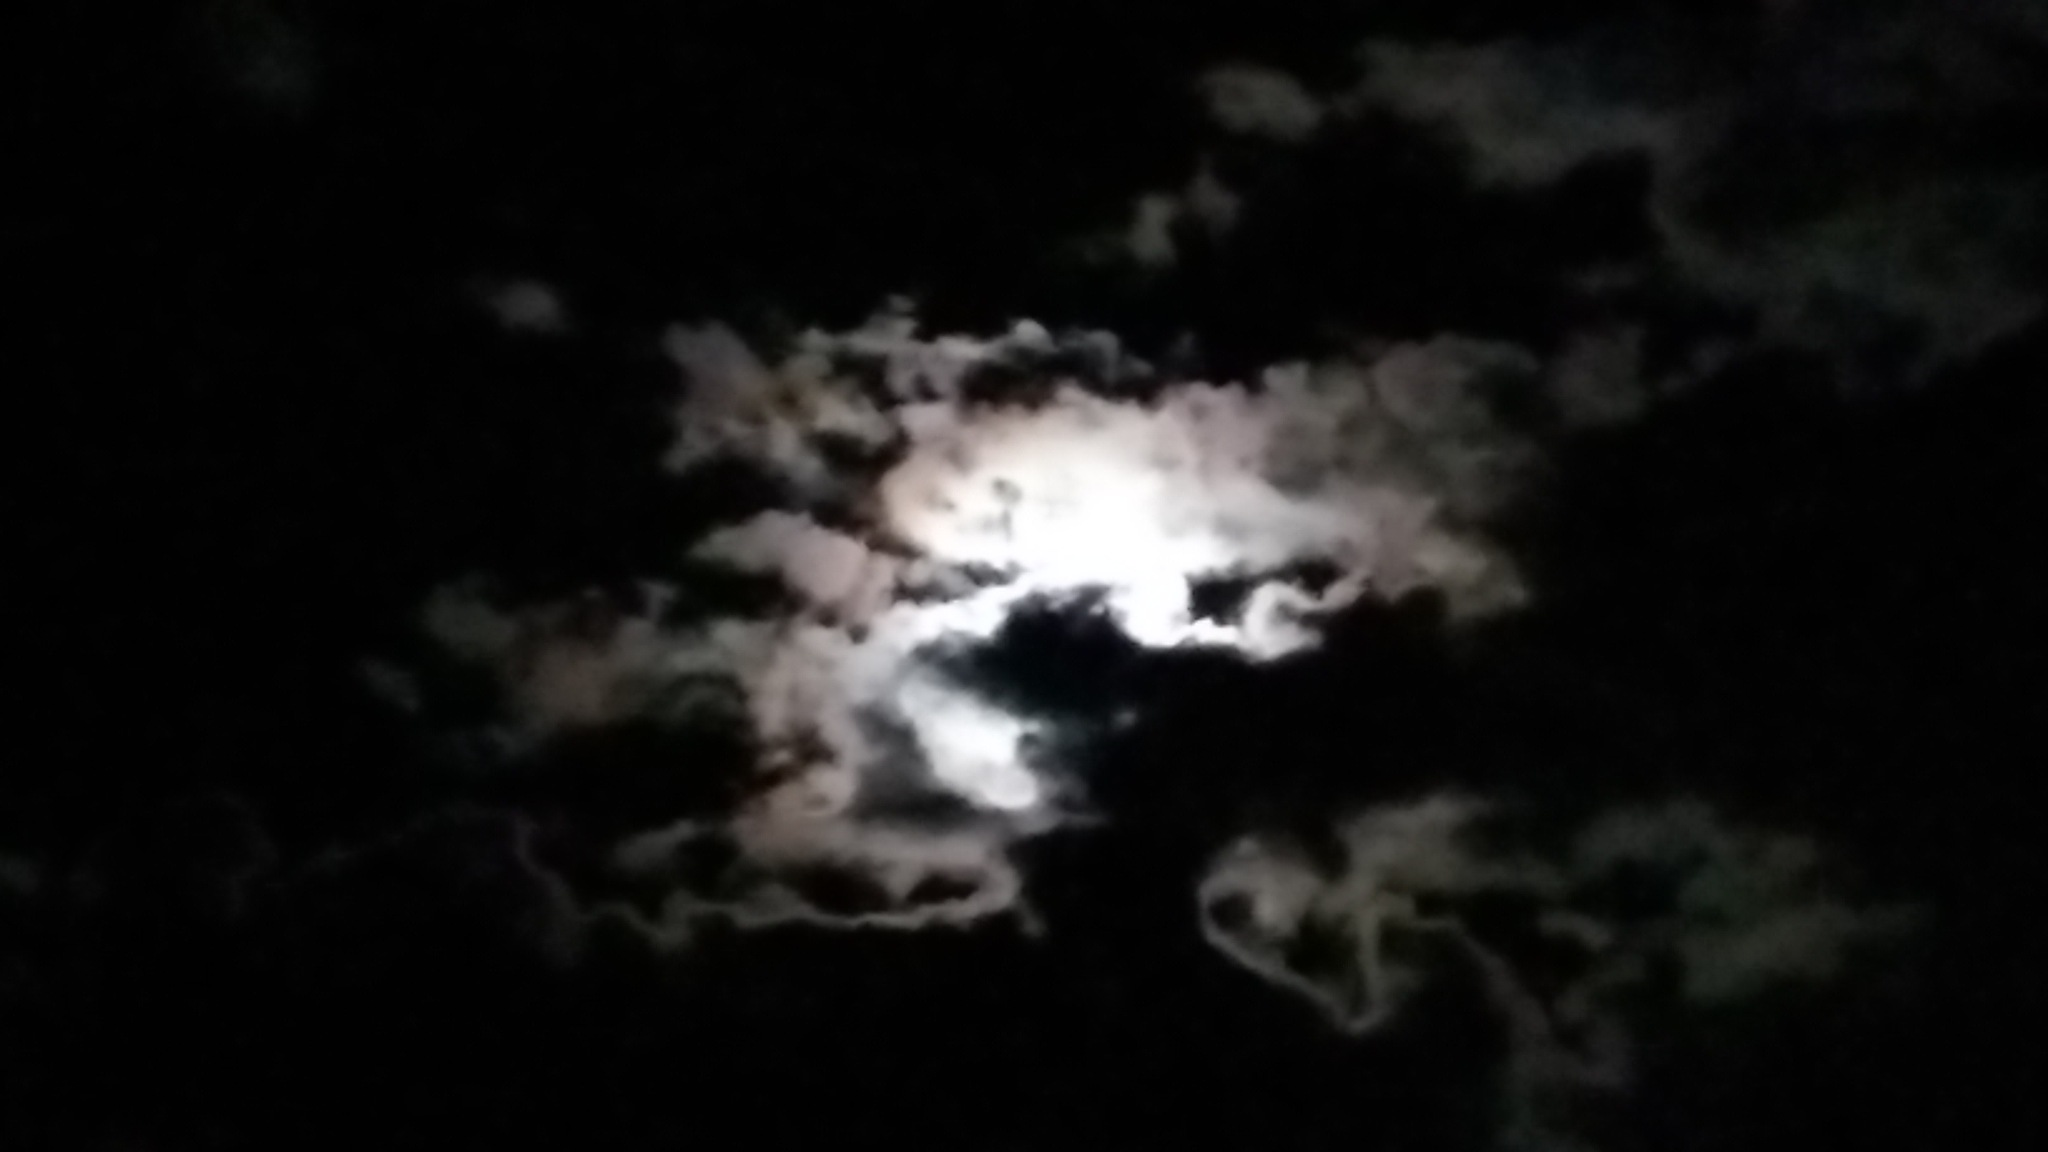 night vision by Rankat